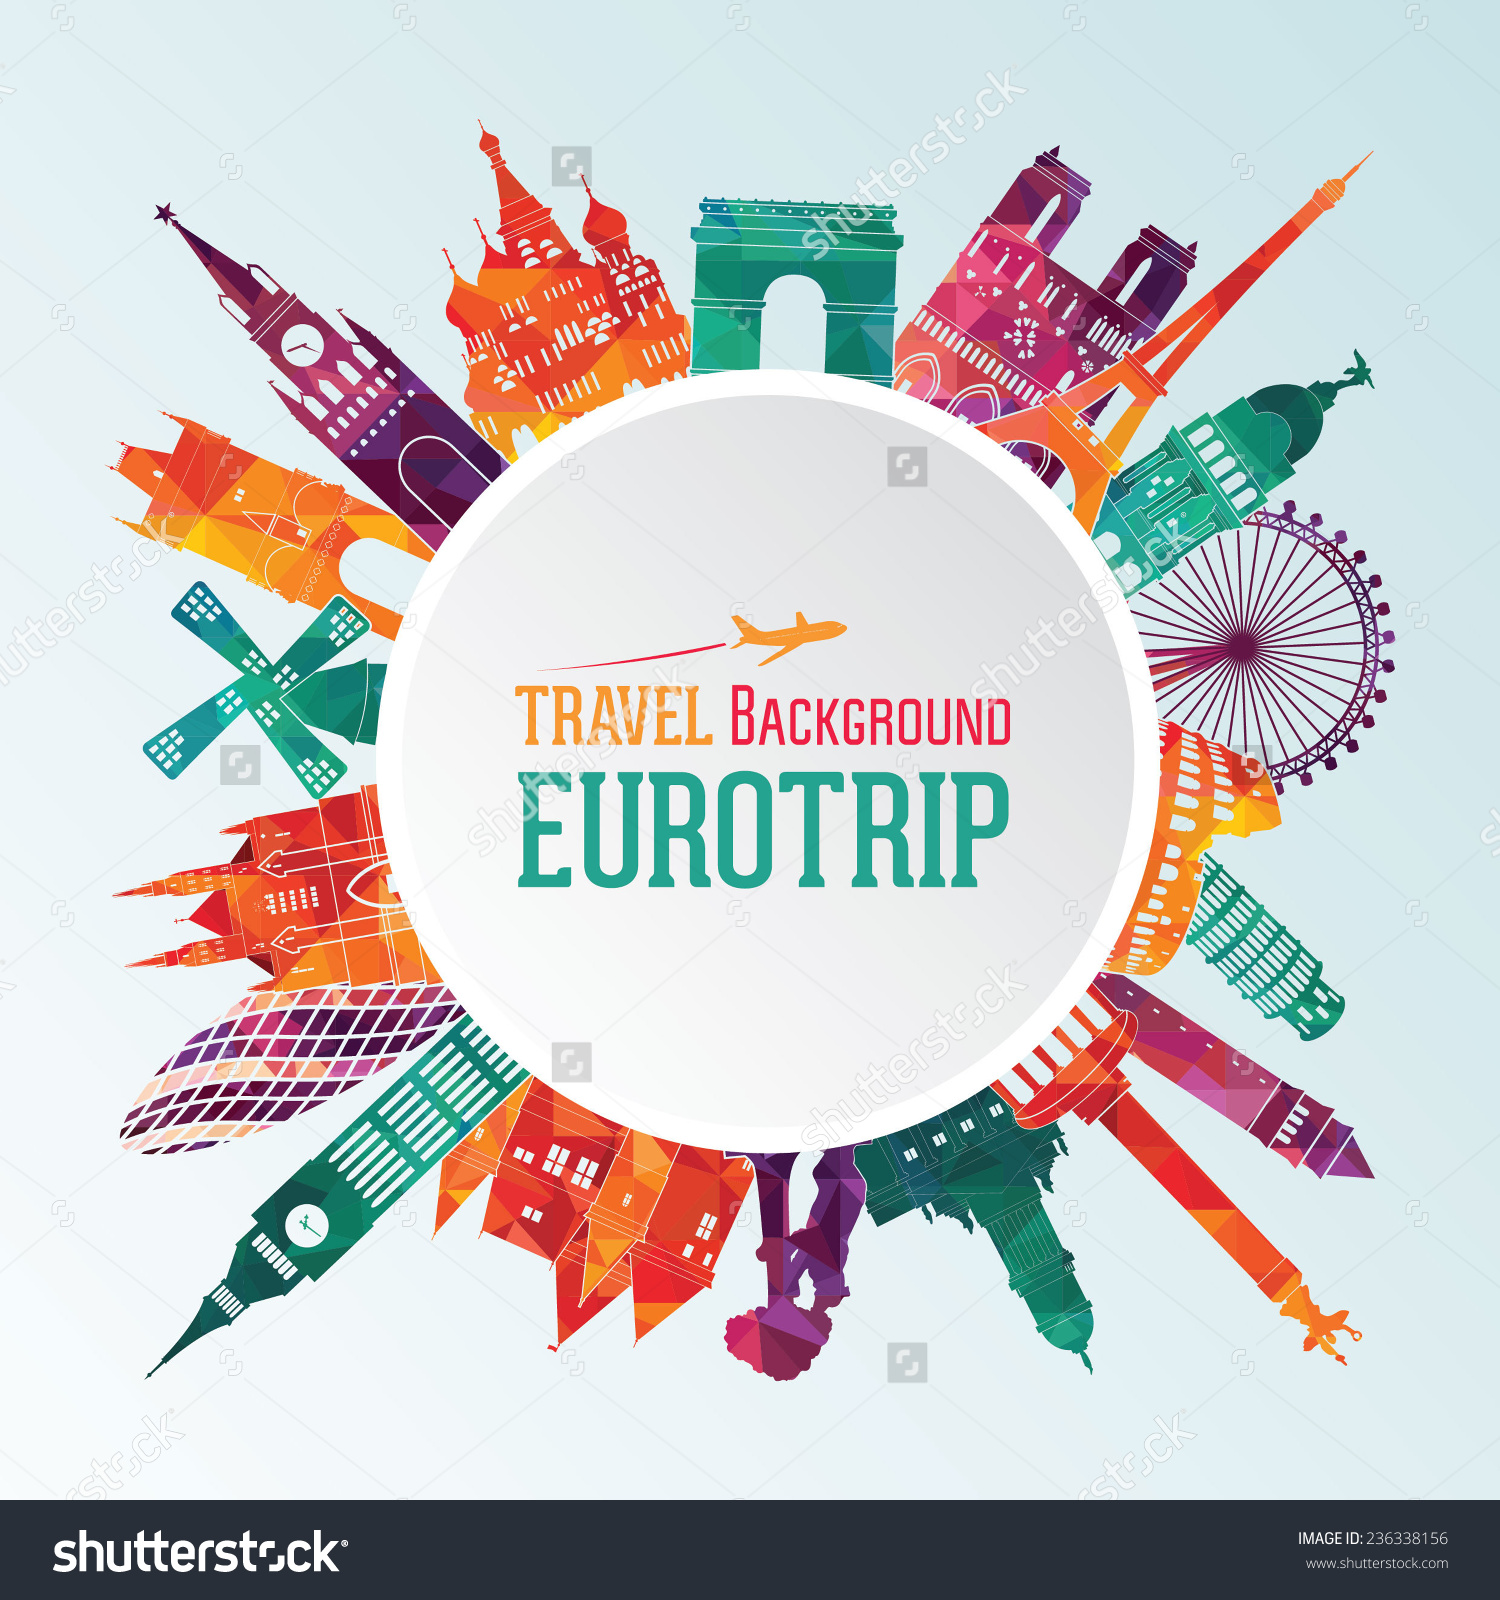 Europe Travel Clip Art.